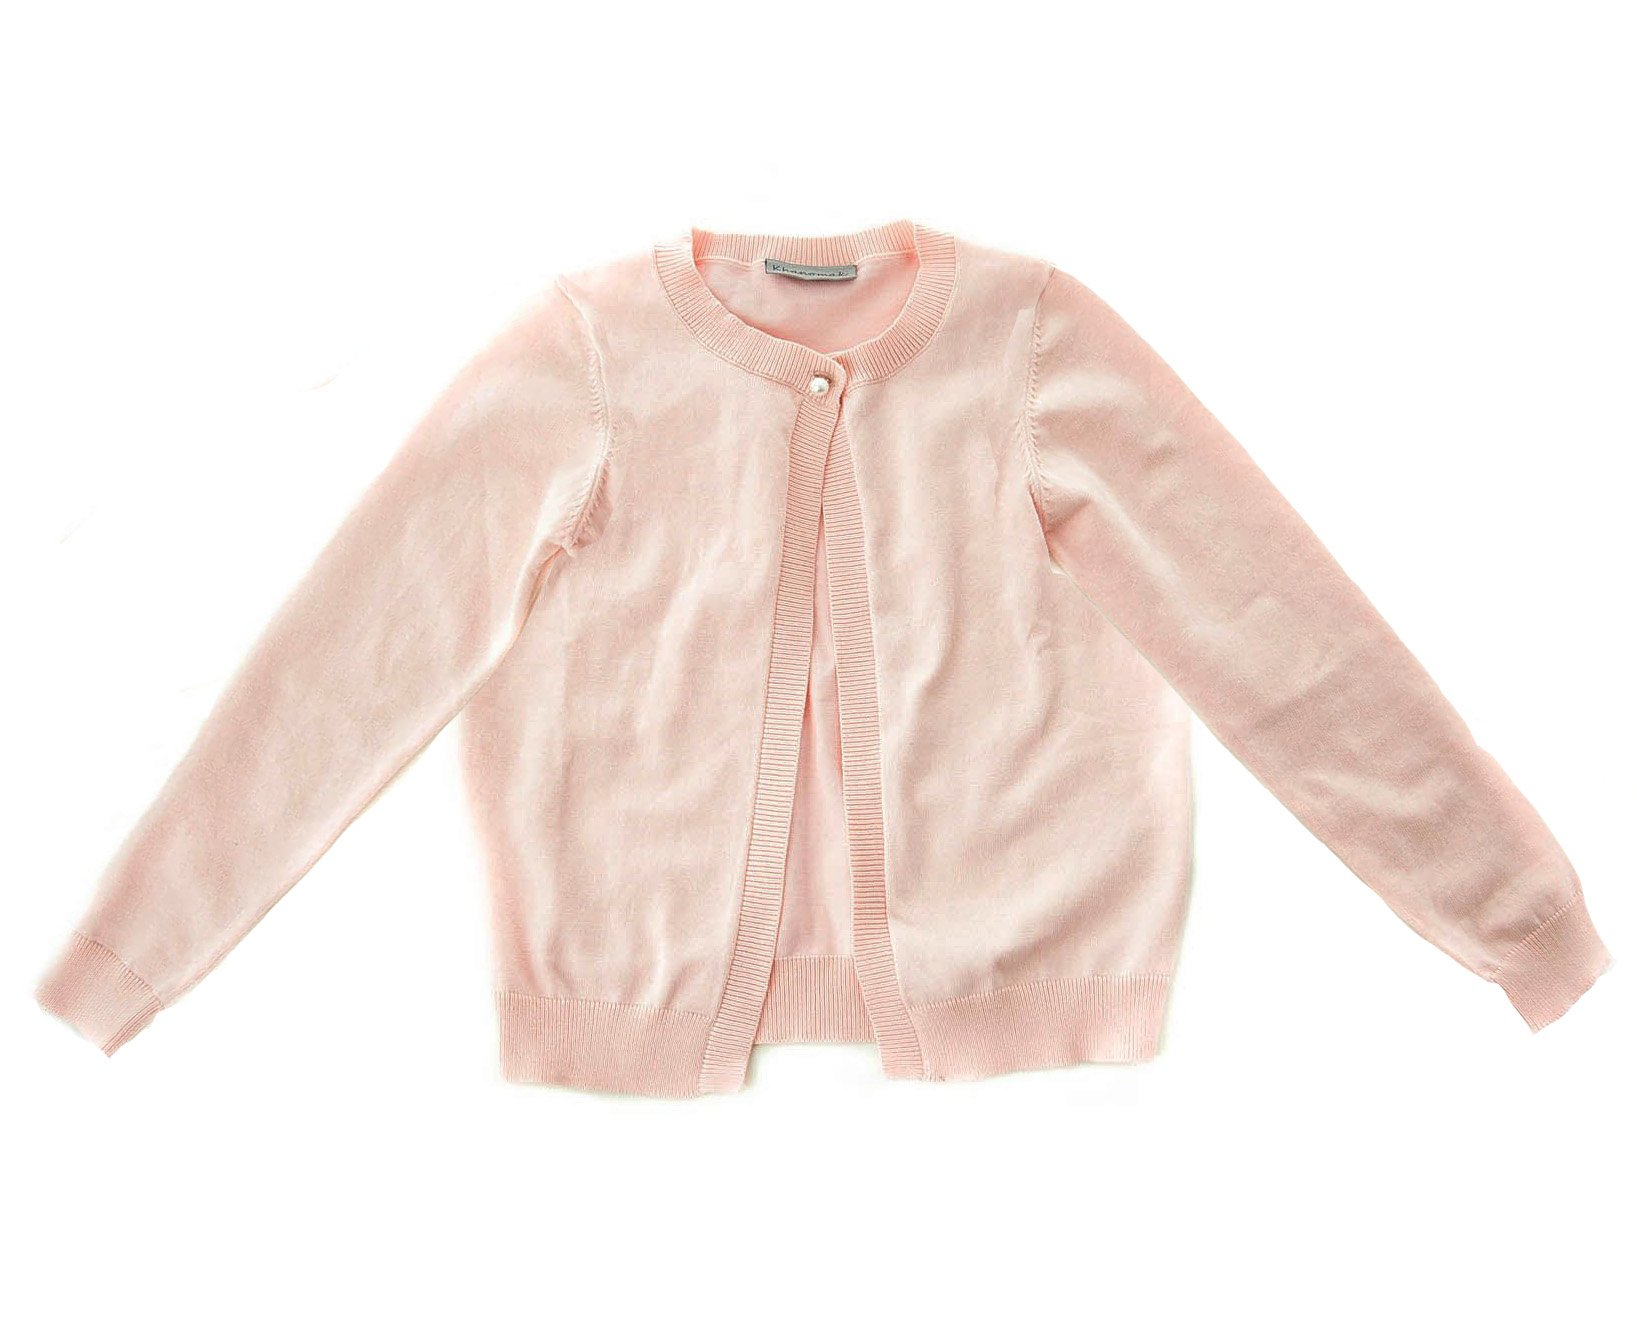 Hollywood Star Fashion Khanomak Women's Kids Girls Cropped Shrug Cardigan Sweater (Size 11/12, Baby Pink)